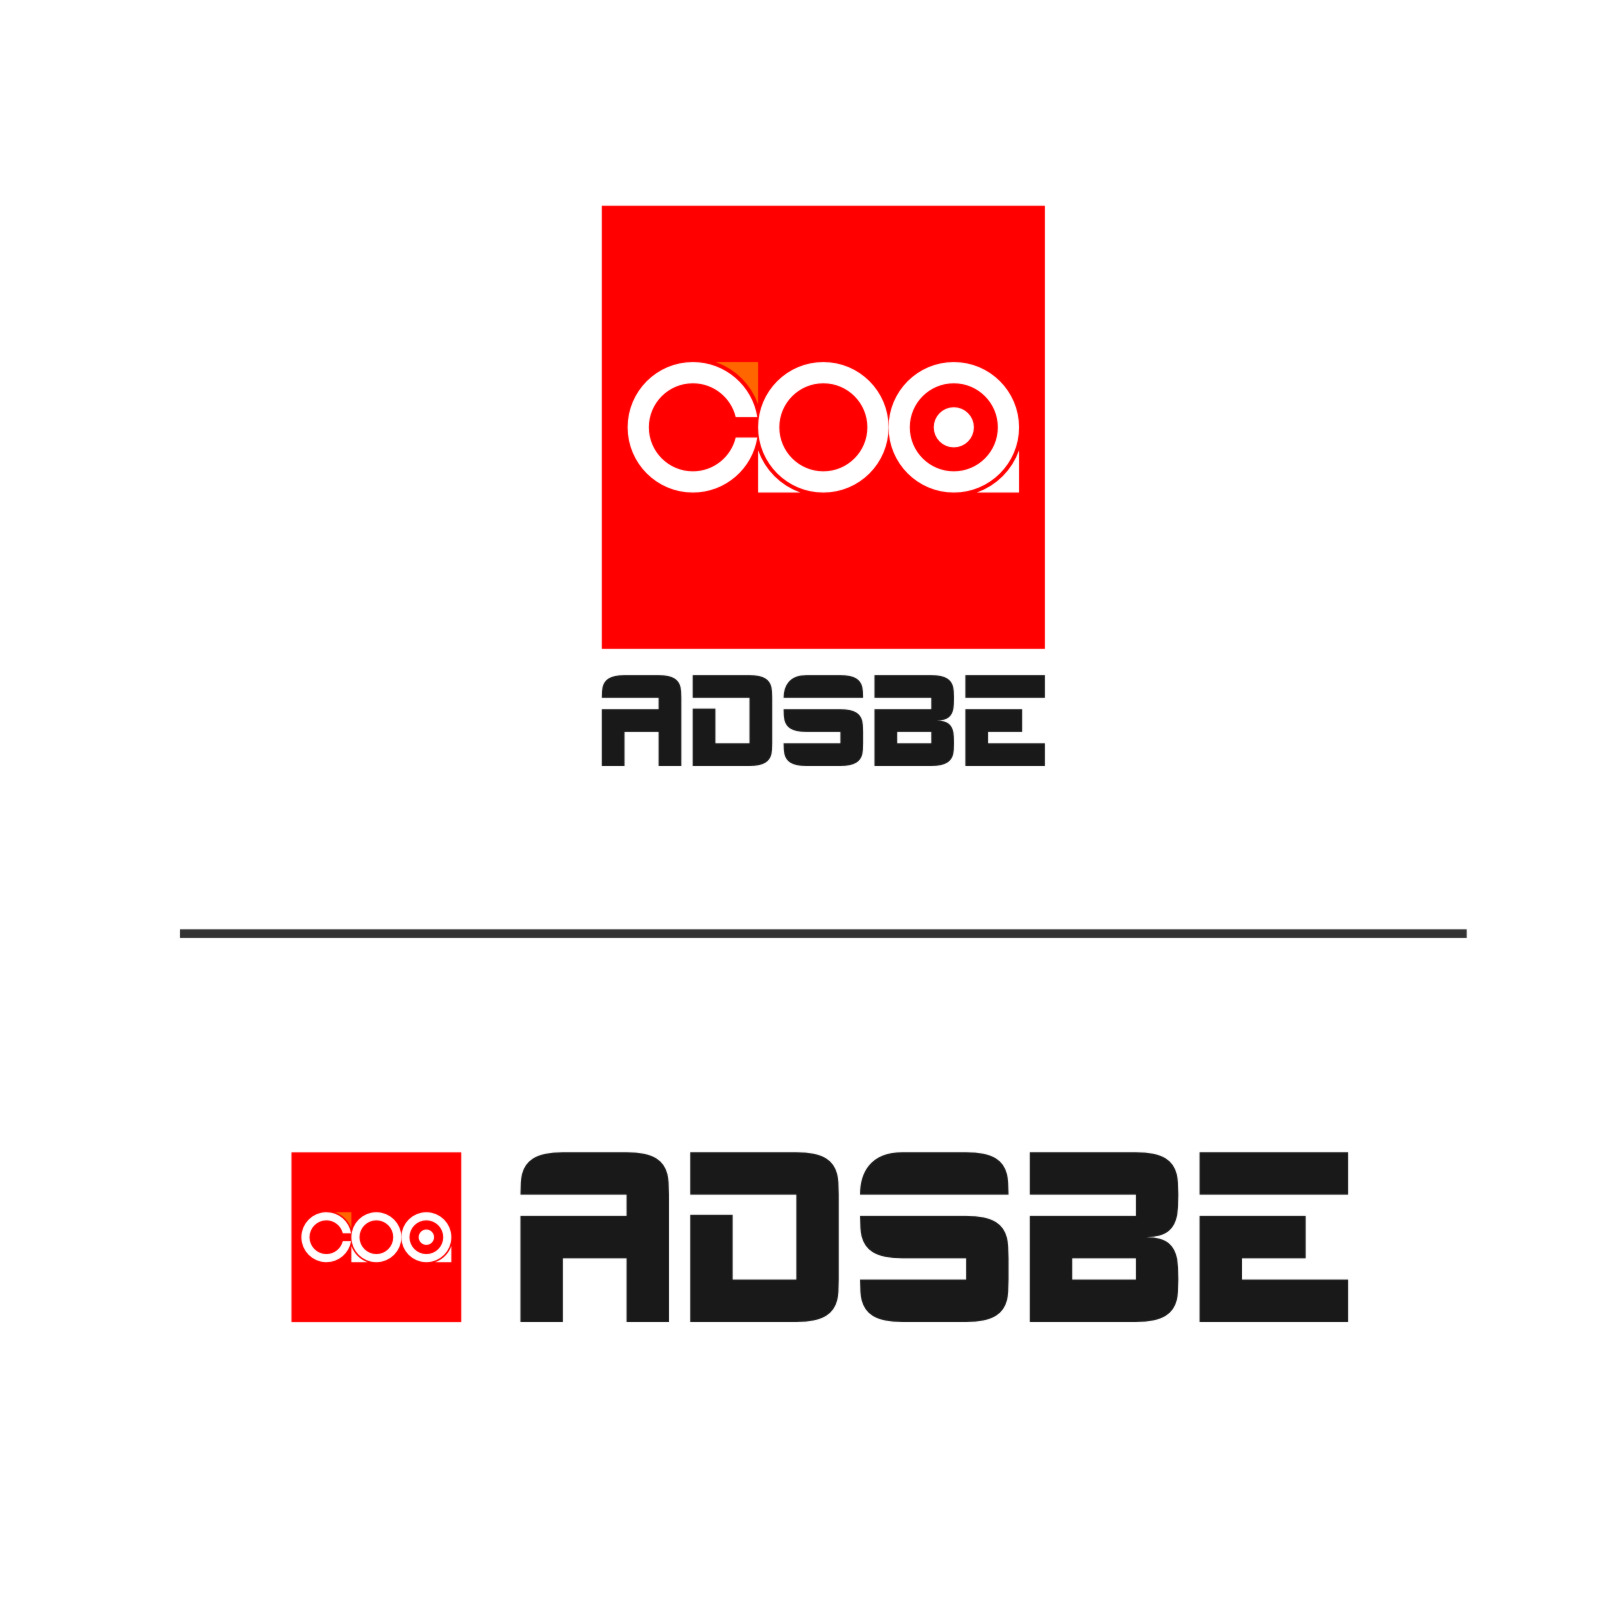 Разработка логотипа для CPA-сети фото f_985586230d3358ba.jpg